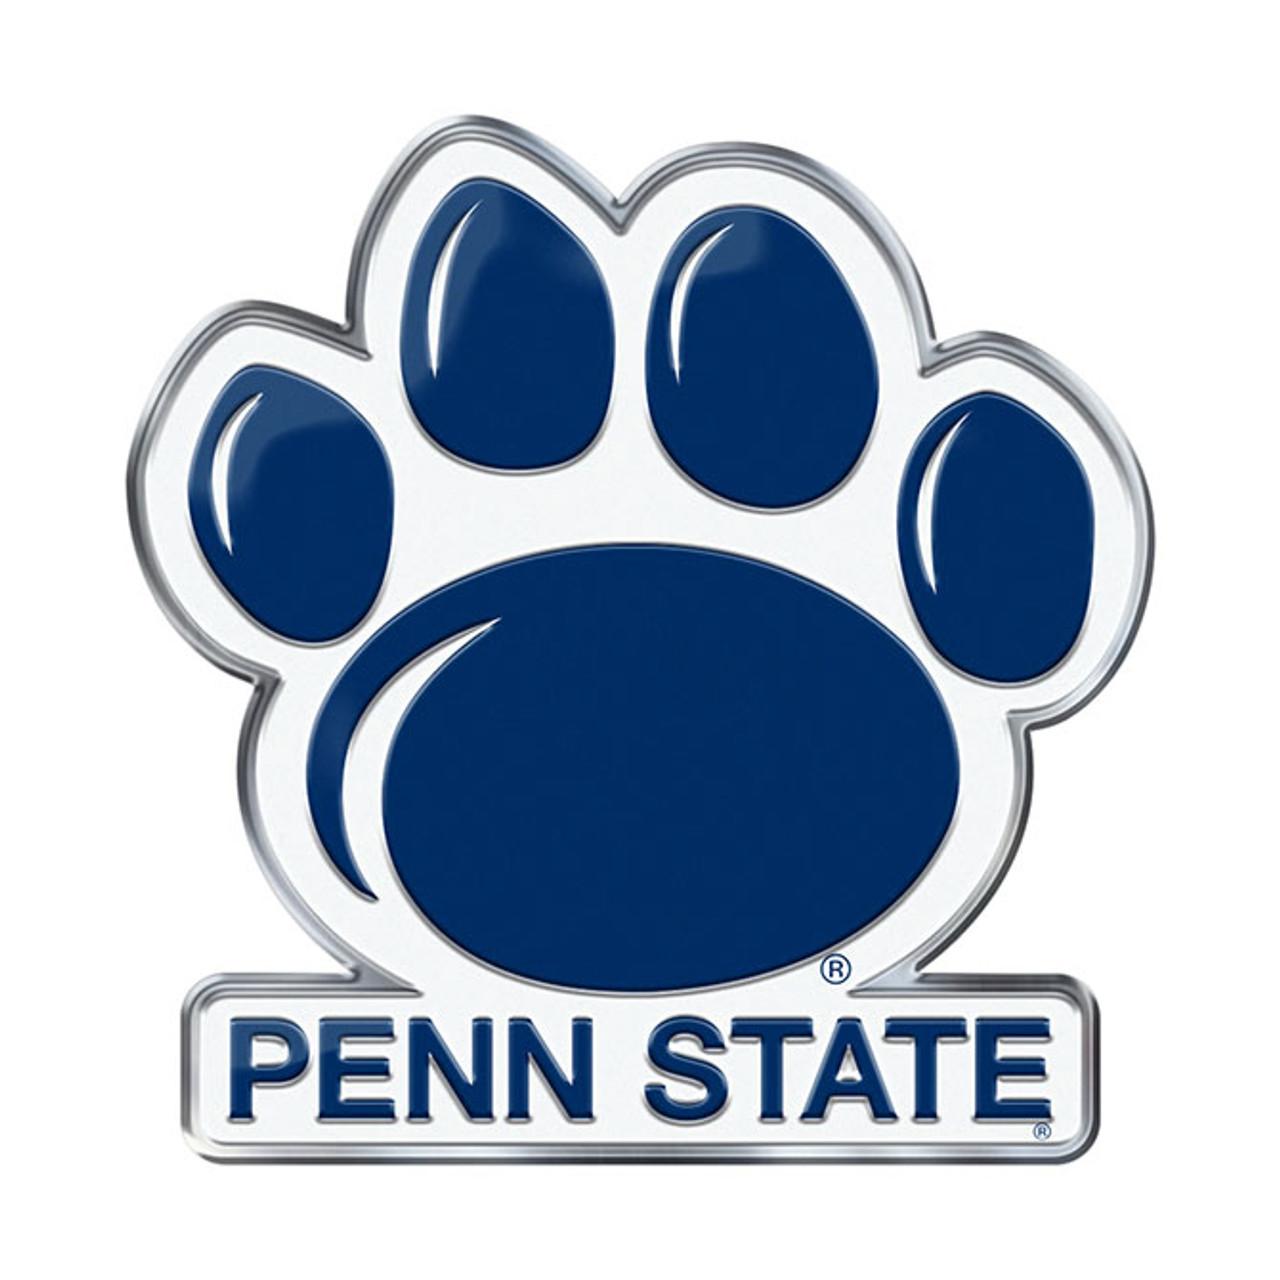 NCAA Penn State Nittany Lions Chrome Automobile Emblem